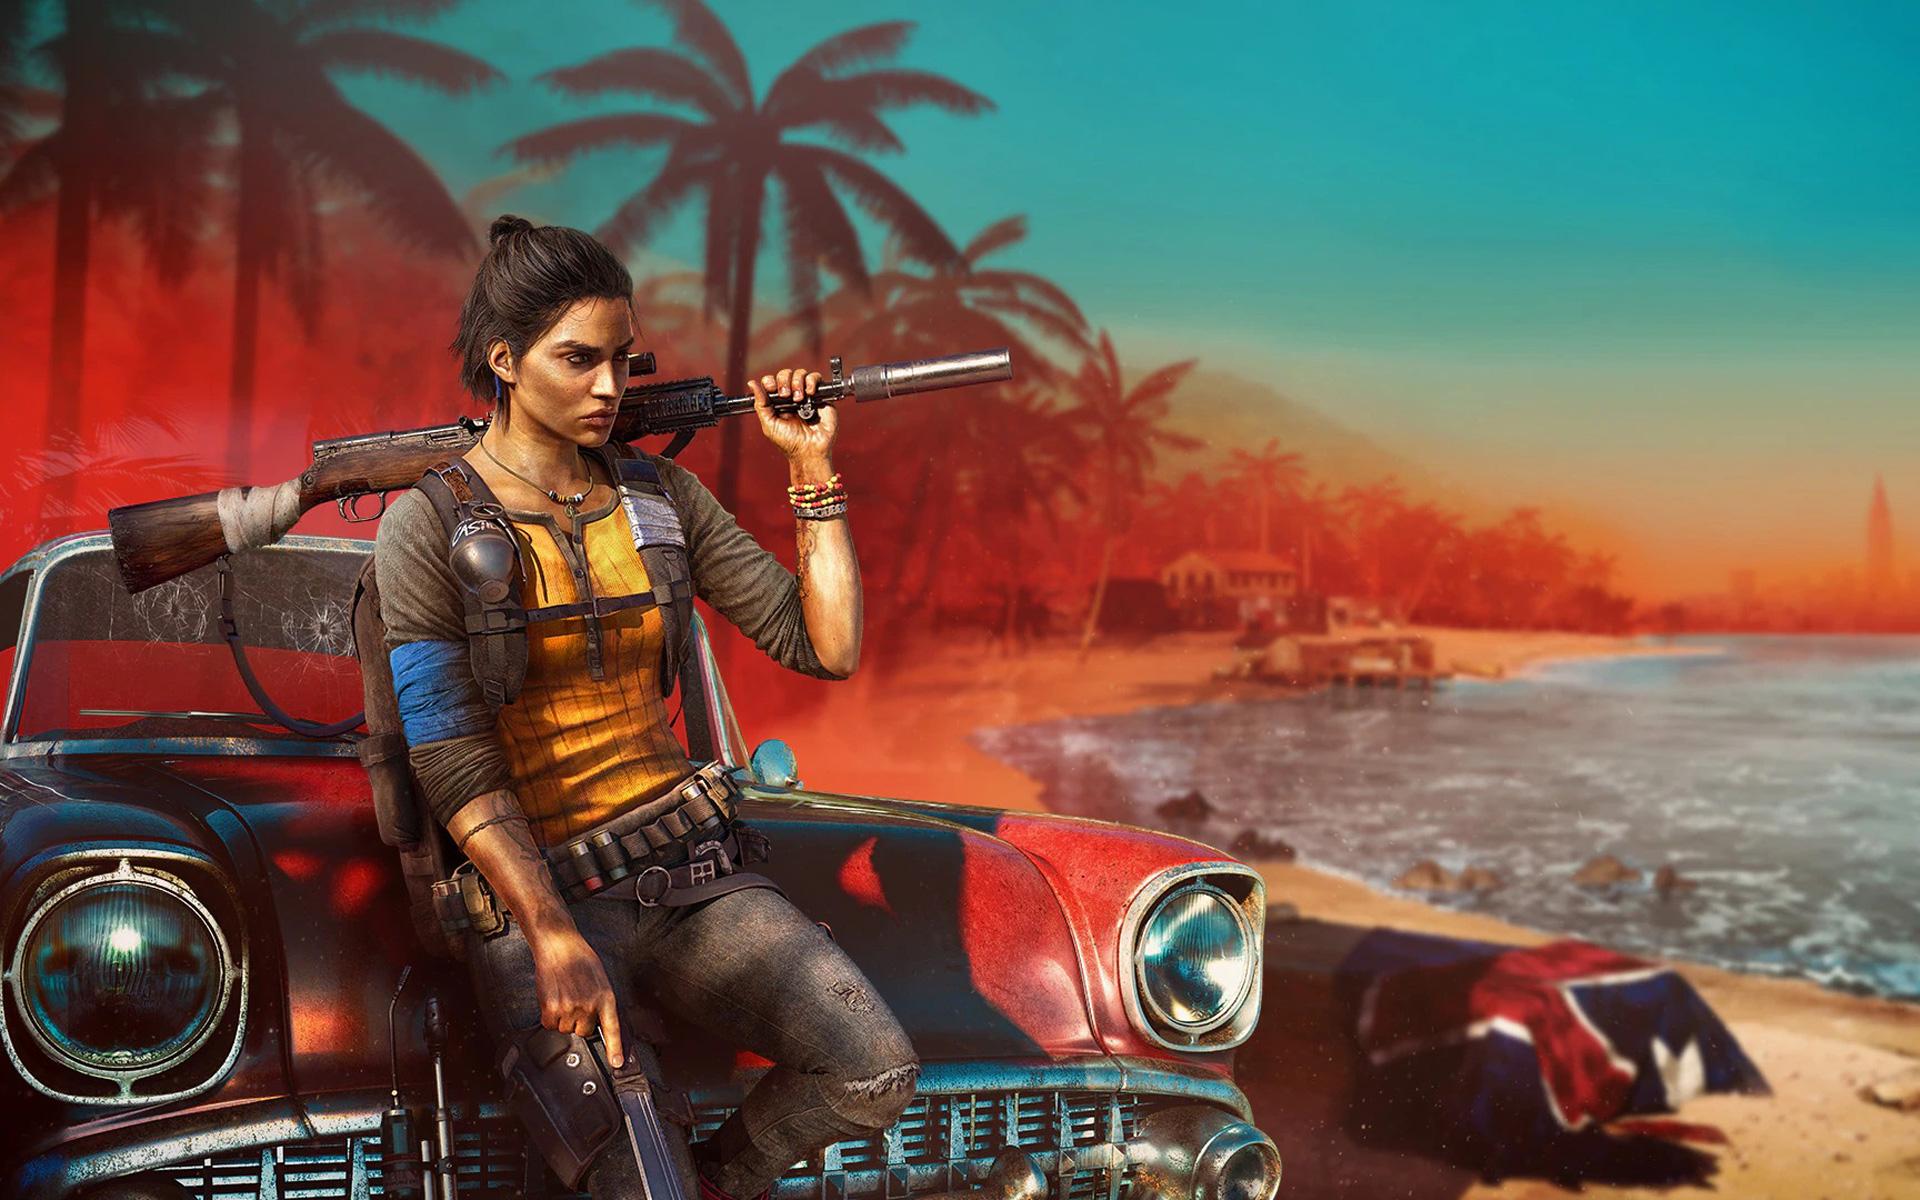 Free Far Cry 6 Wallpaper in 1920x1200